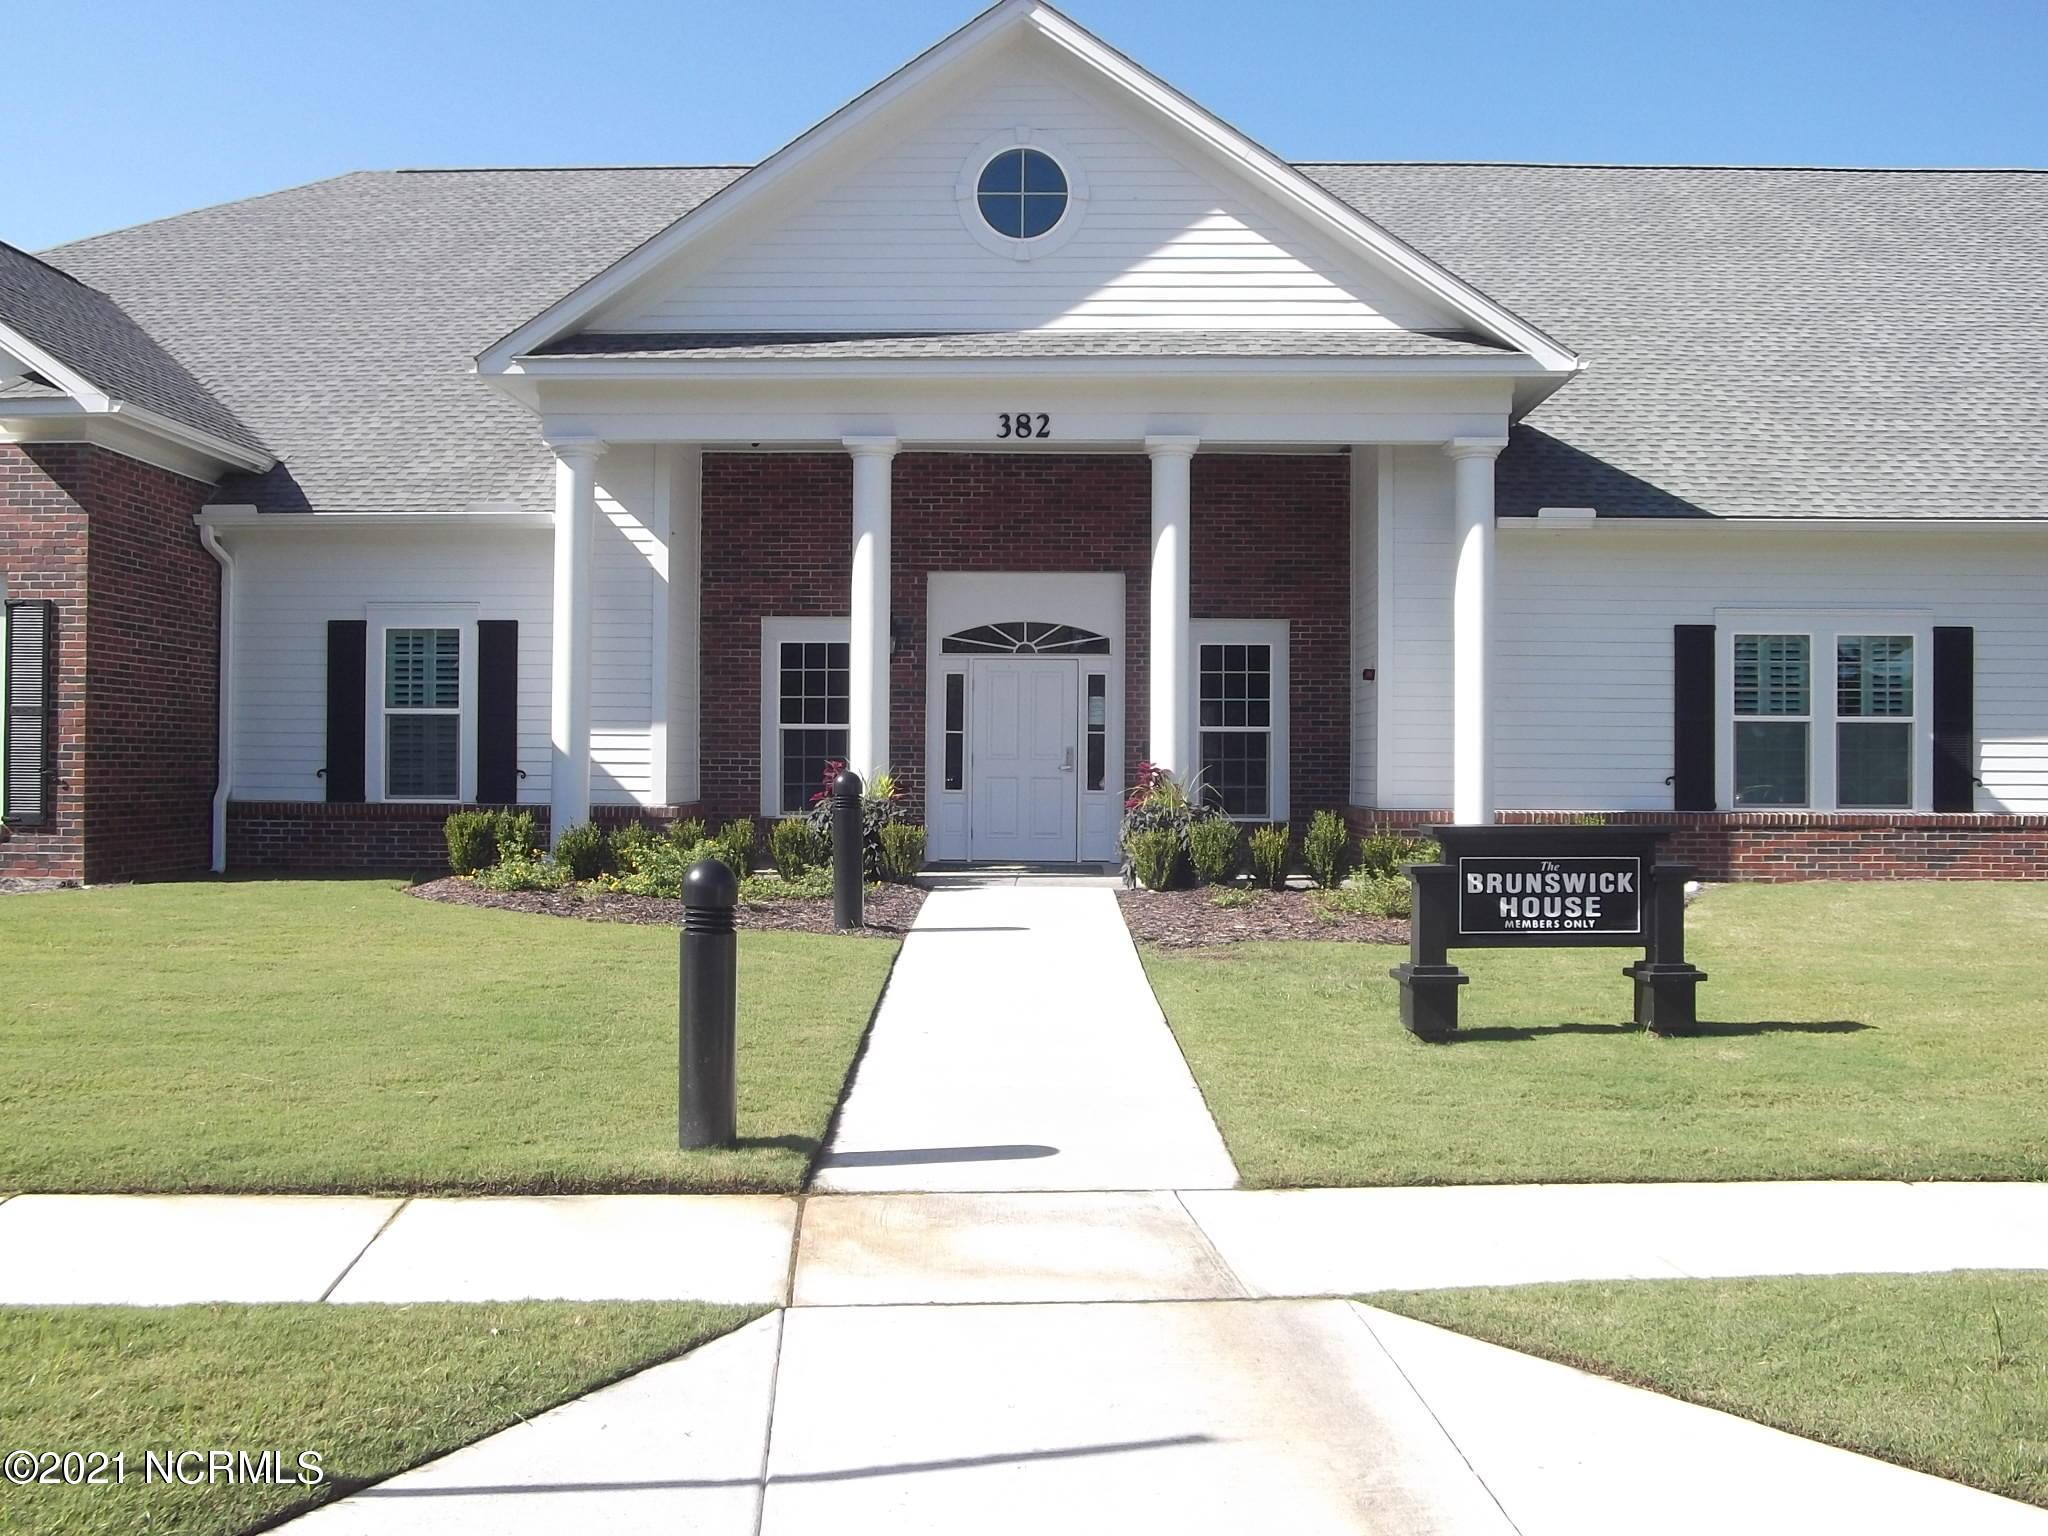 216 Ravennaside Drive, Calabash, North Carolina 28467, ,Residential land,For sale,Ravennaside,100170110